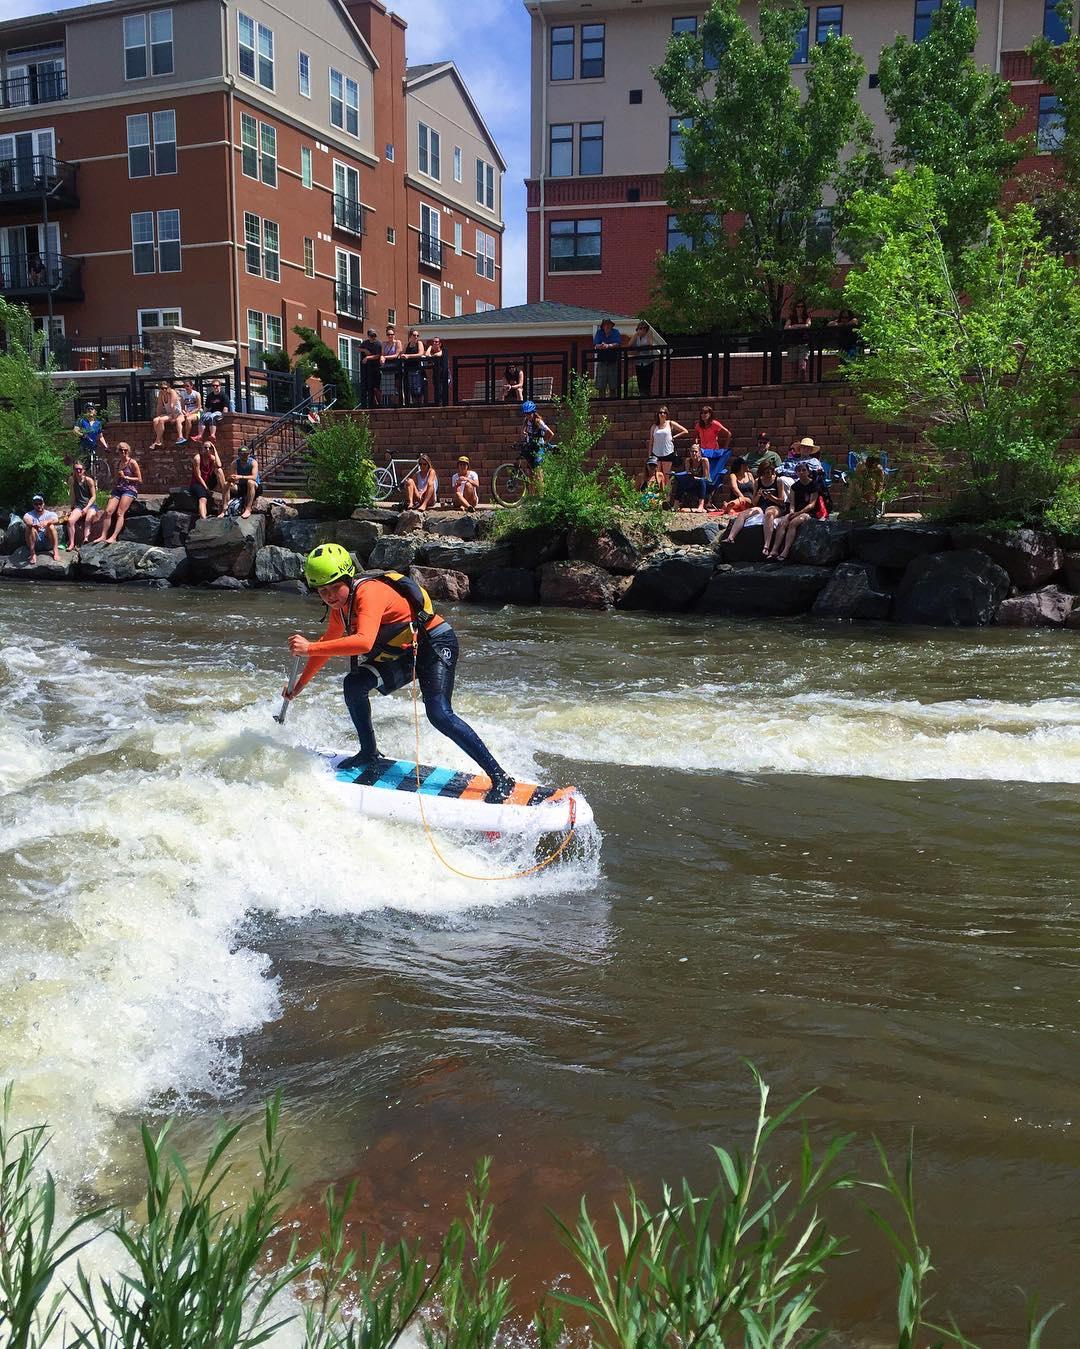 The Golden Games River Surf Comp